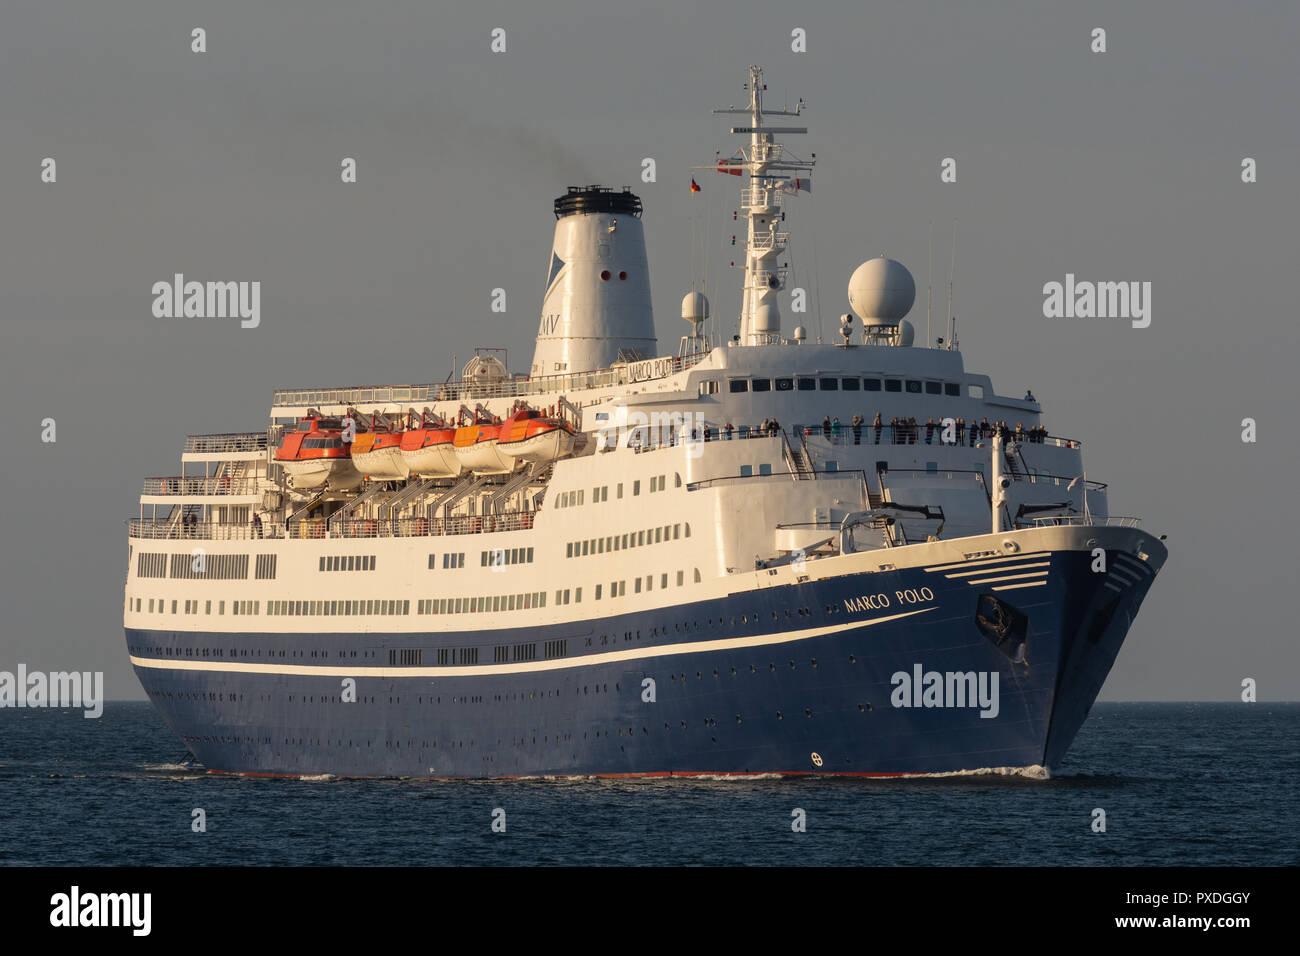 Cruiseship Marco Polo inbound Kiel fjord, bound for Holtenau locks, later Kiel canalStock Photo